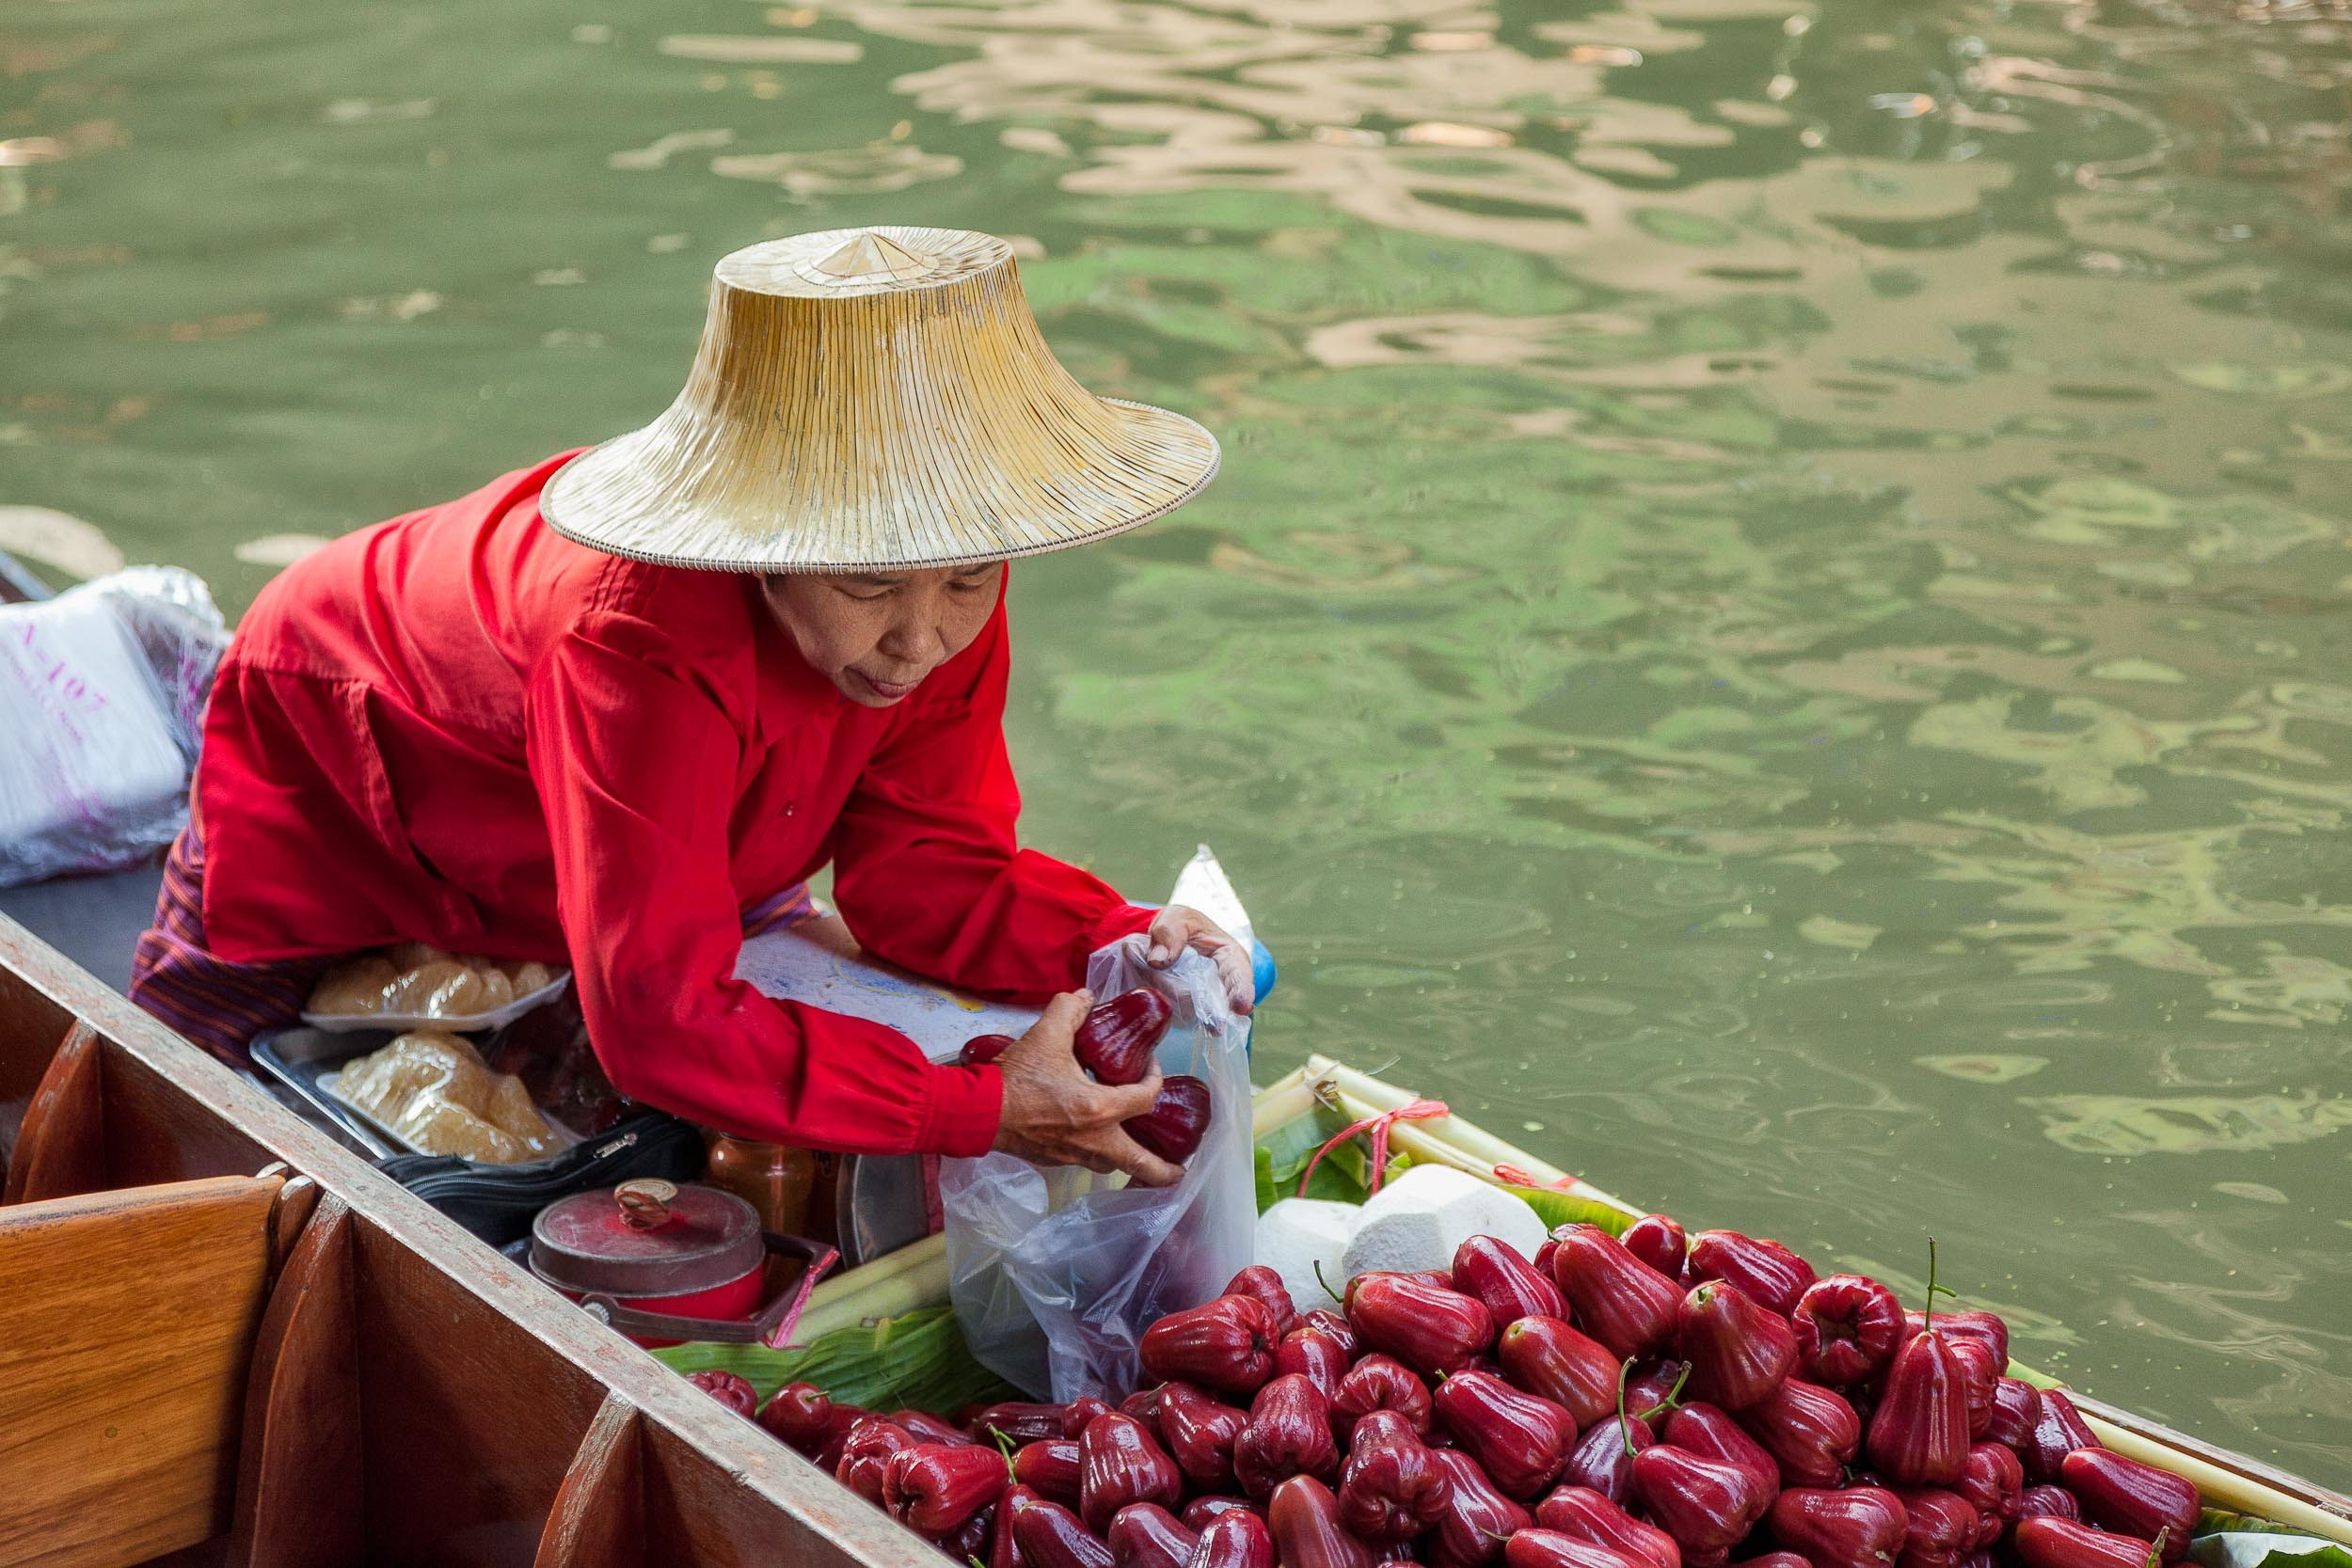 An elderly    female food vendor    selling produce from her    long-tail boat    at the popular    Damnoen Saduak Floating Market    near    Bangkok, Thailand   .